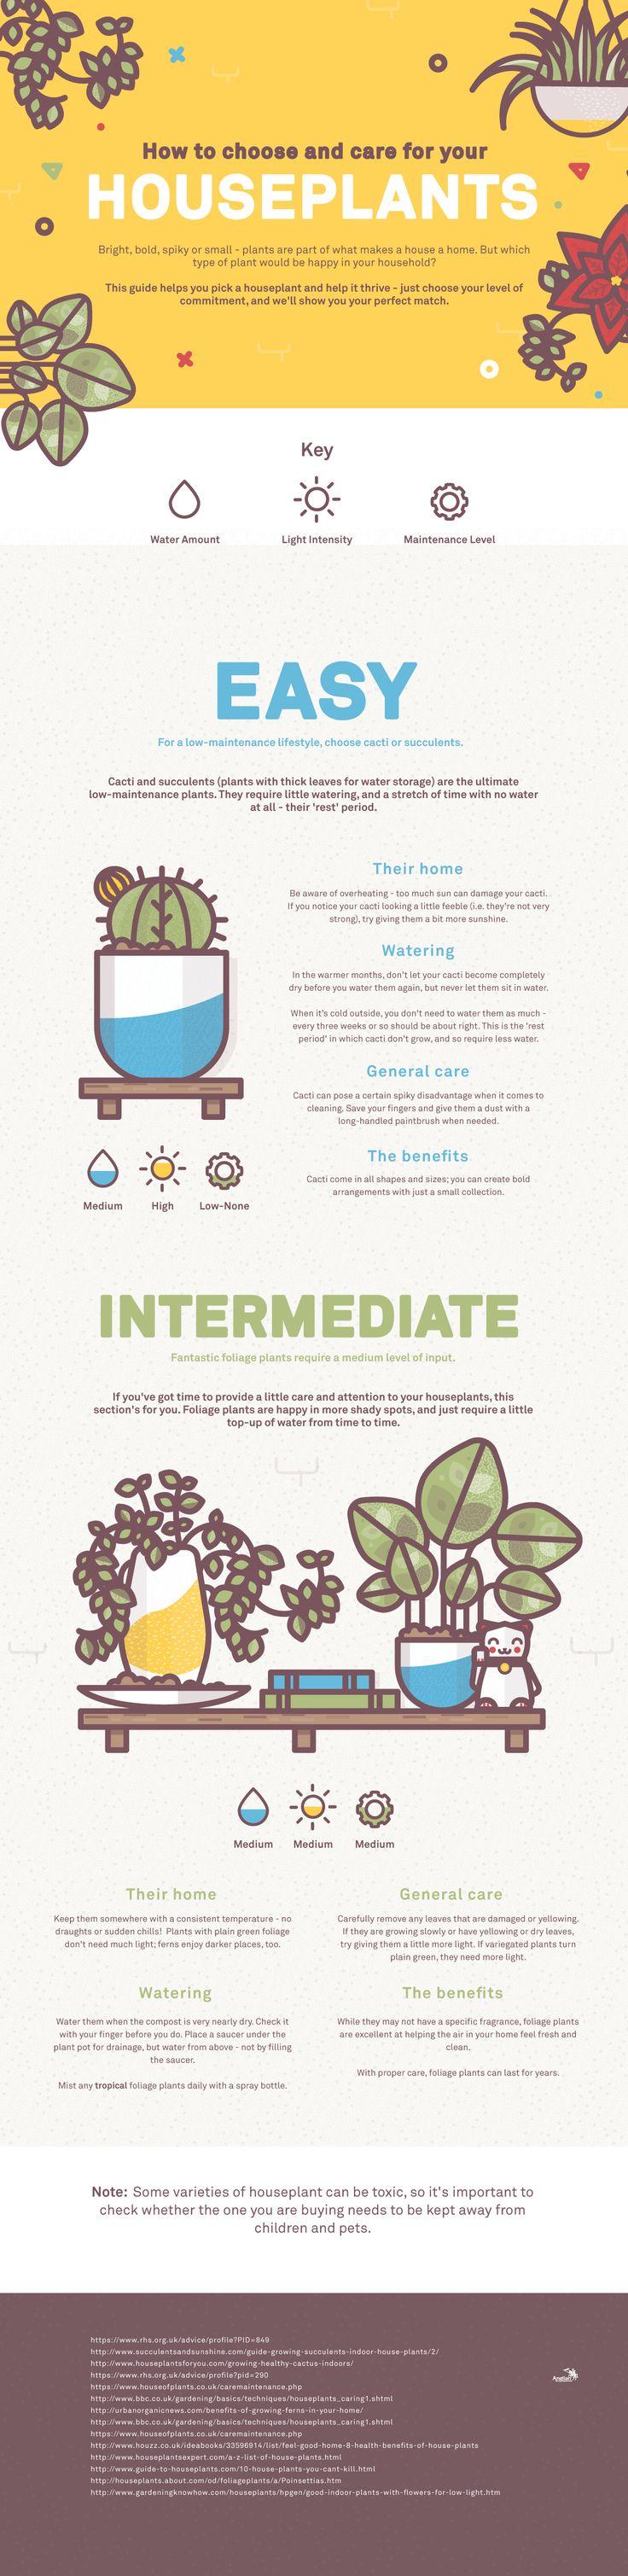 Infographic Illustration | Lucas Jubb Design & Illustration